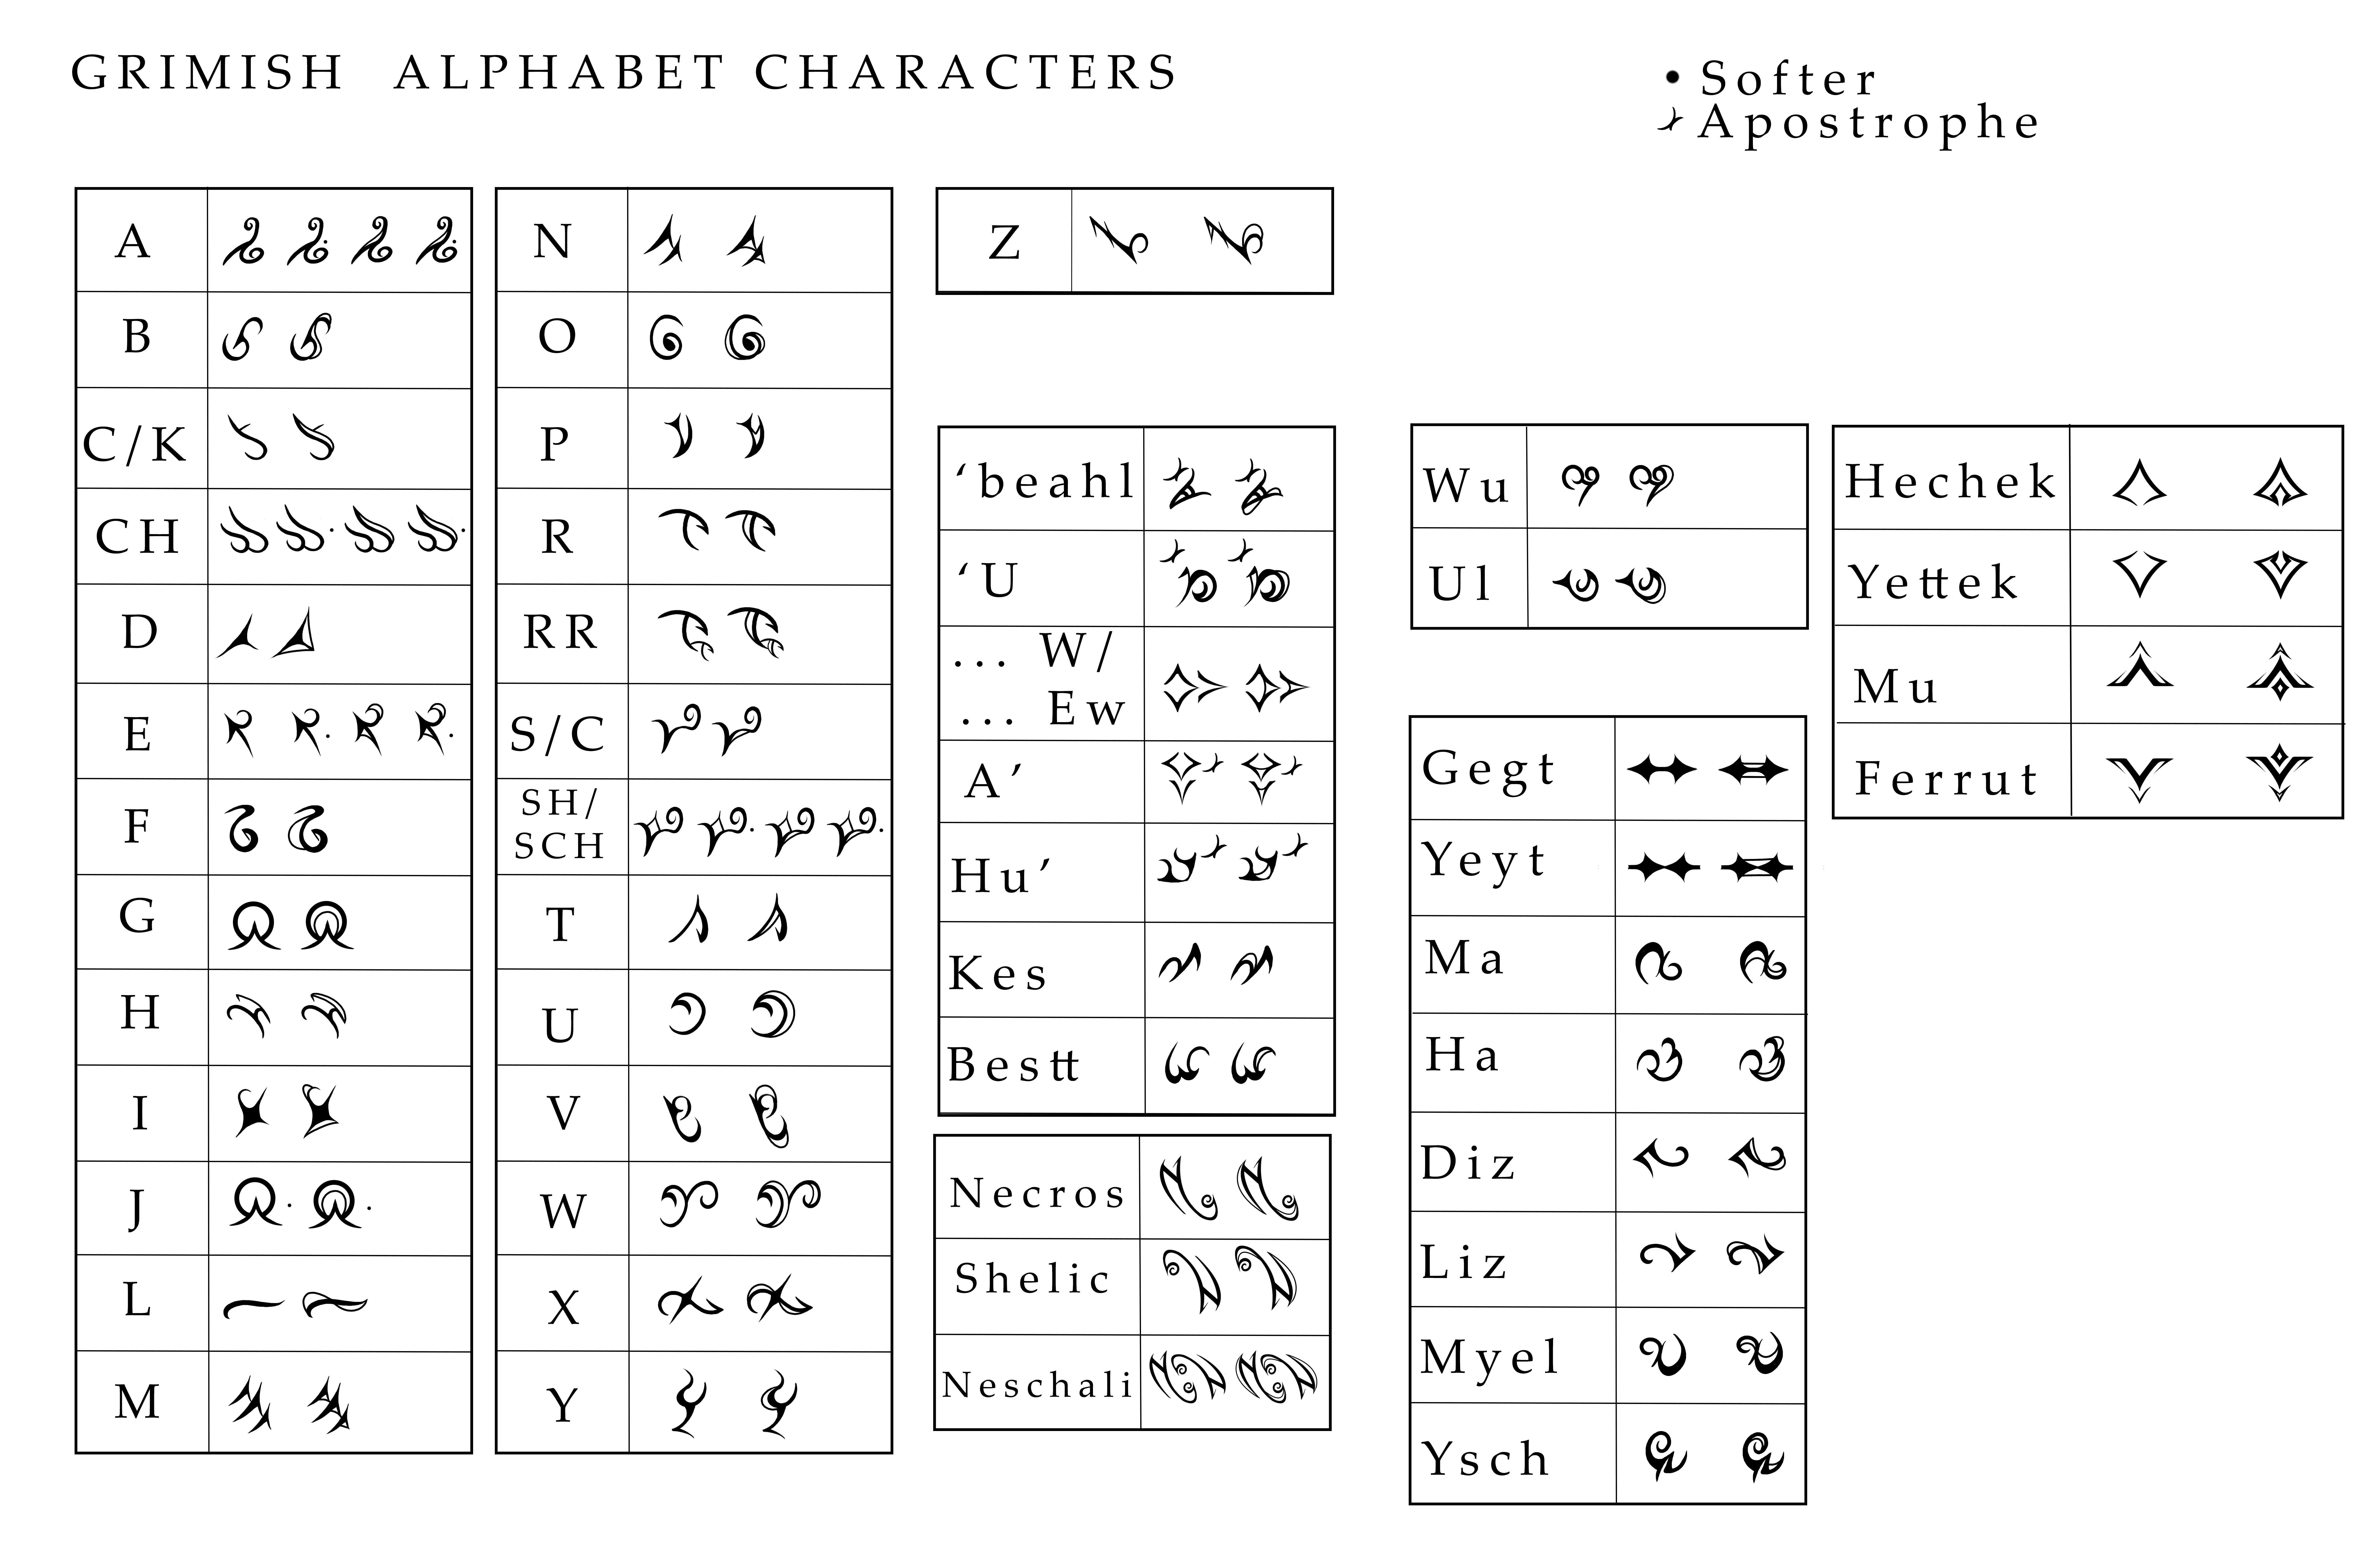 Grimish Character Chart